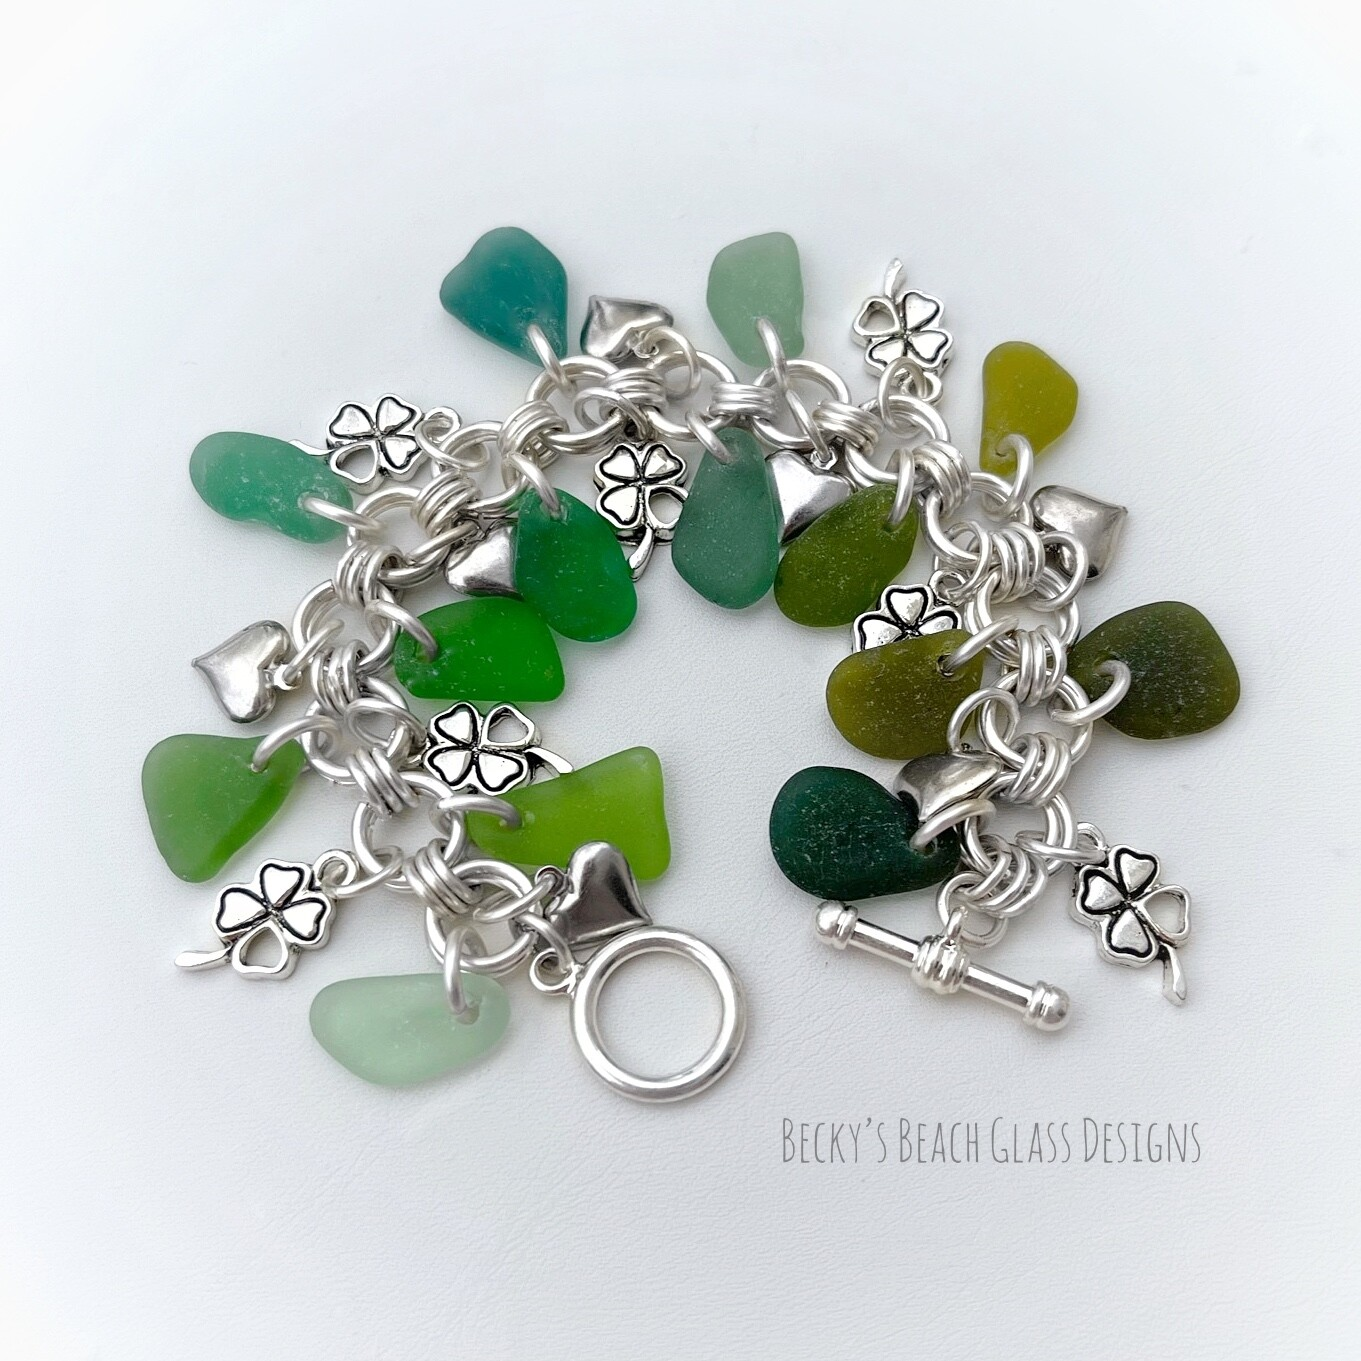 Seaglass Clover & Hearts Cha Cha Bracelet